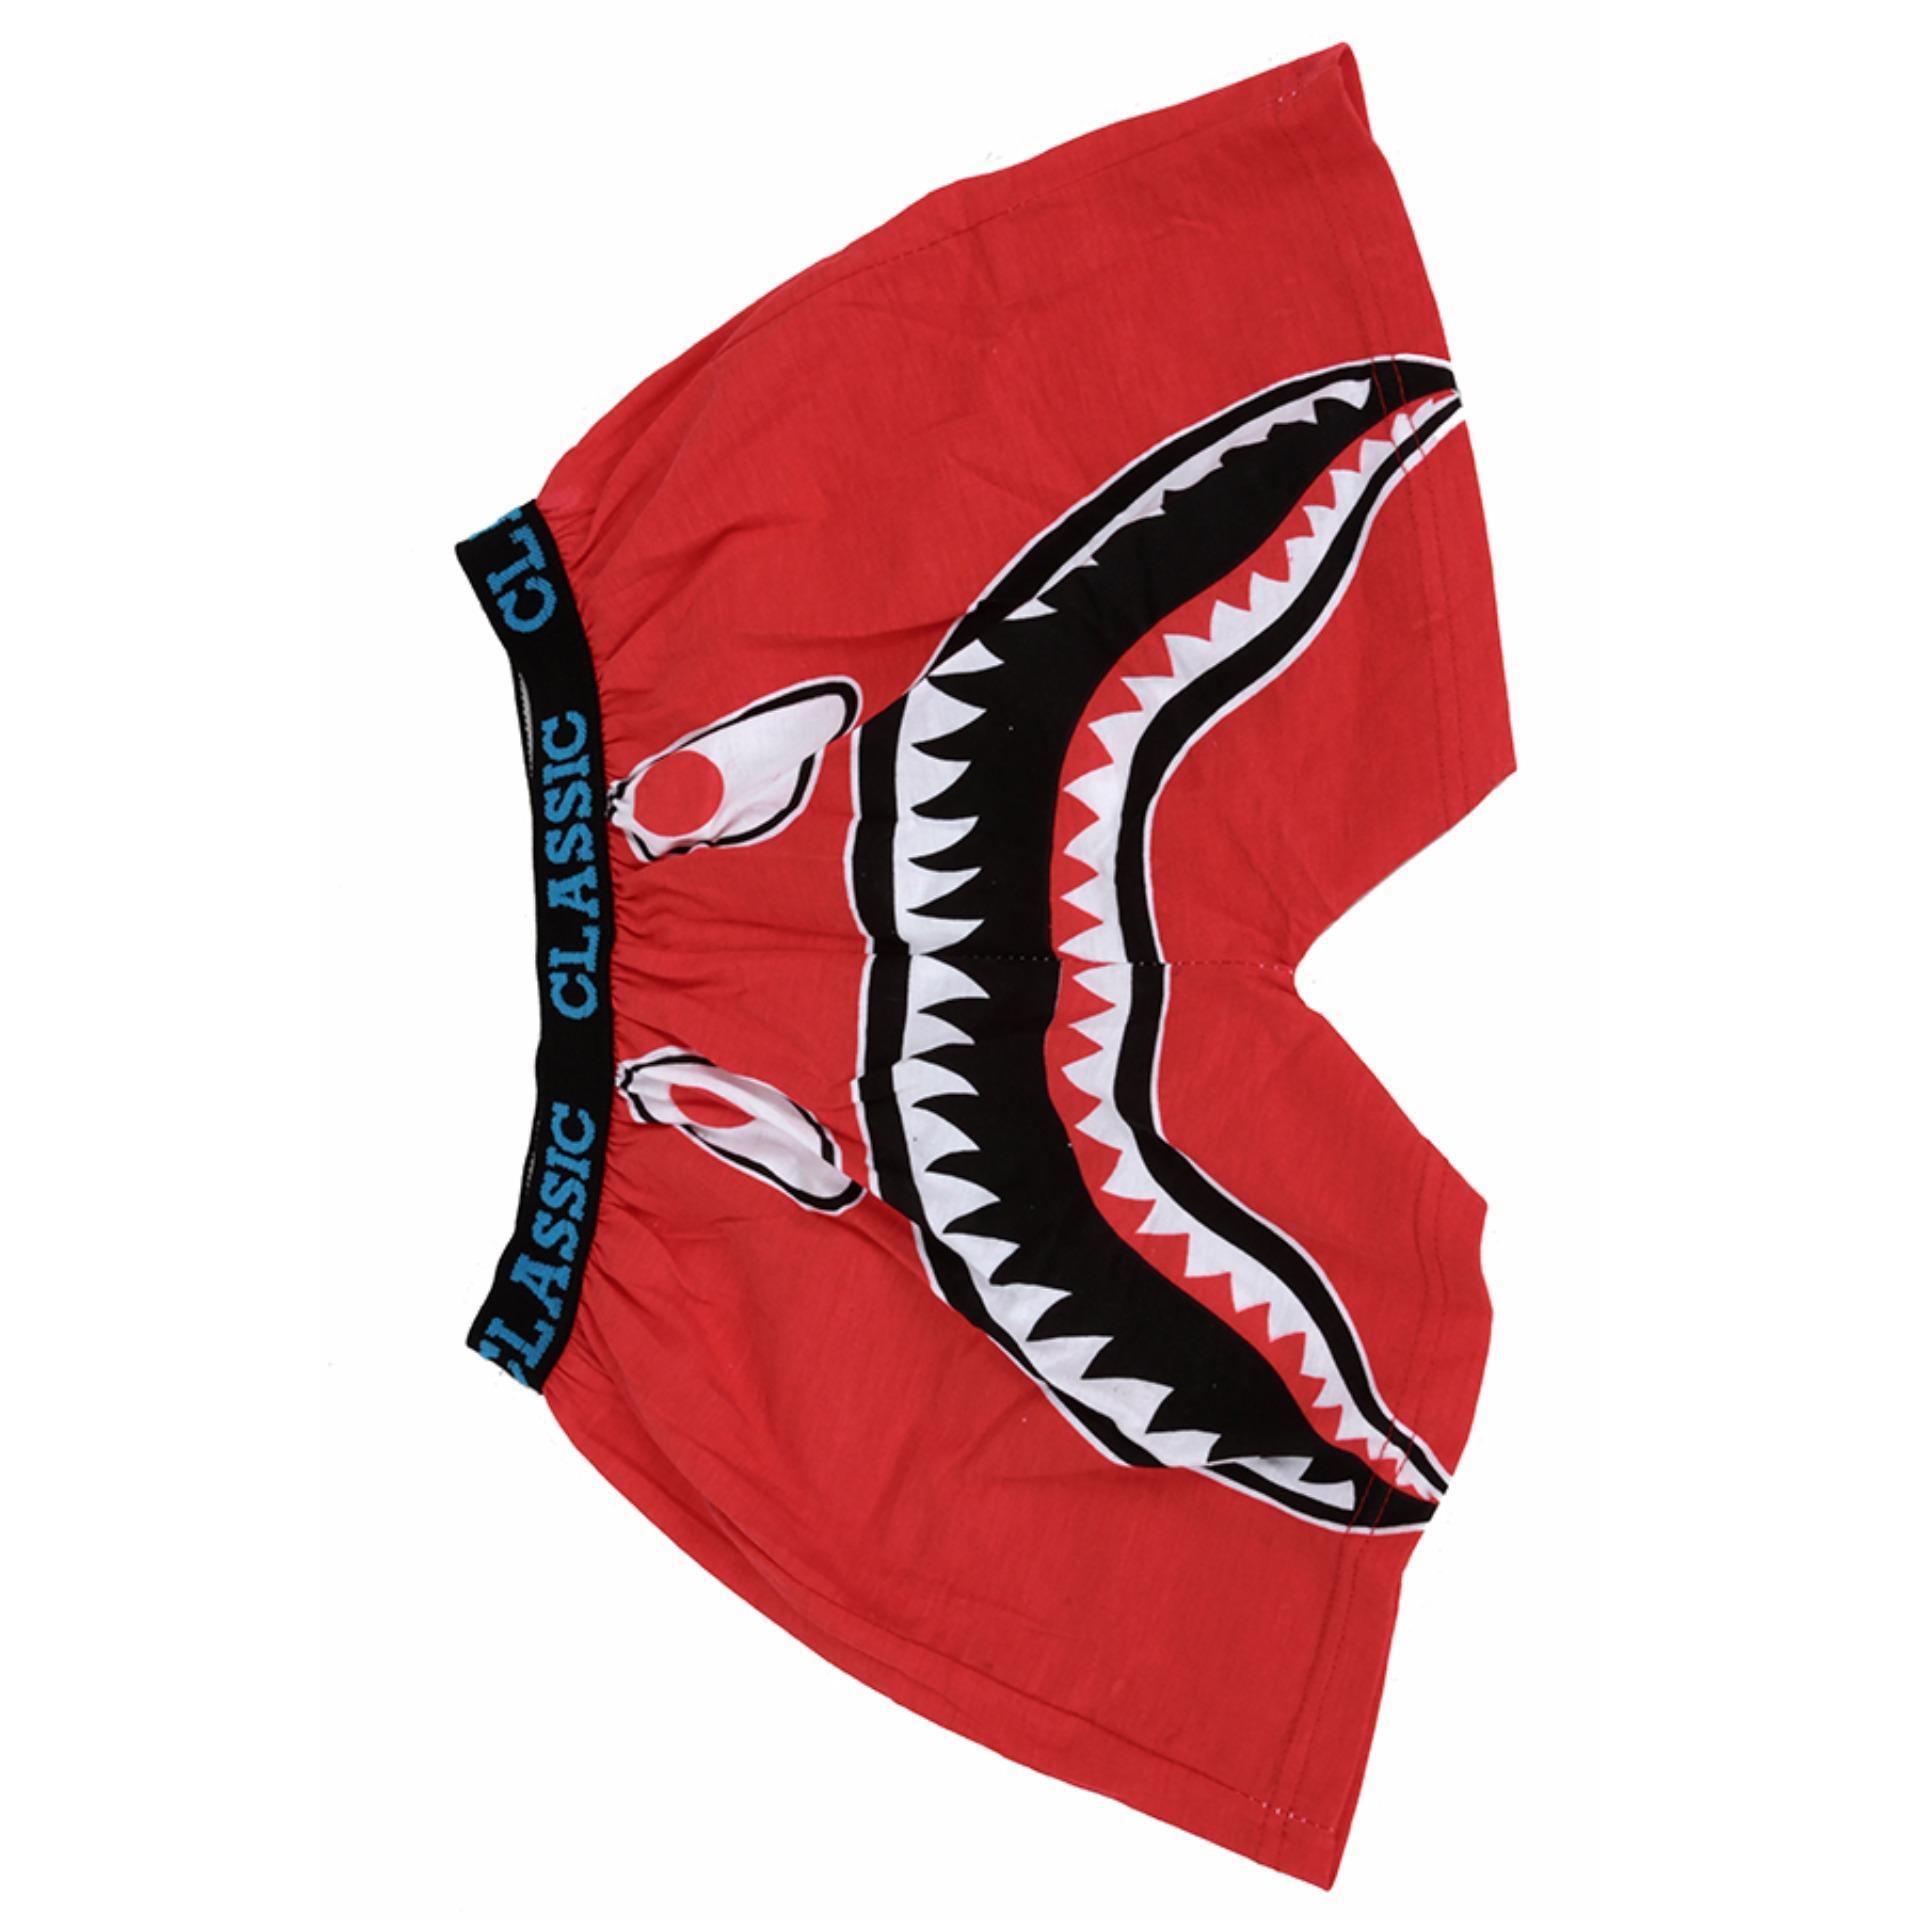 Elfs Shop Celana Boxer Pokeball Merah Cabe Daftar Harga Terlengkap Pria Spandek Dongker Box 612 Santai Dalam Pendek Bape Shark